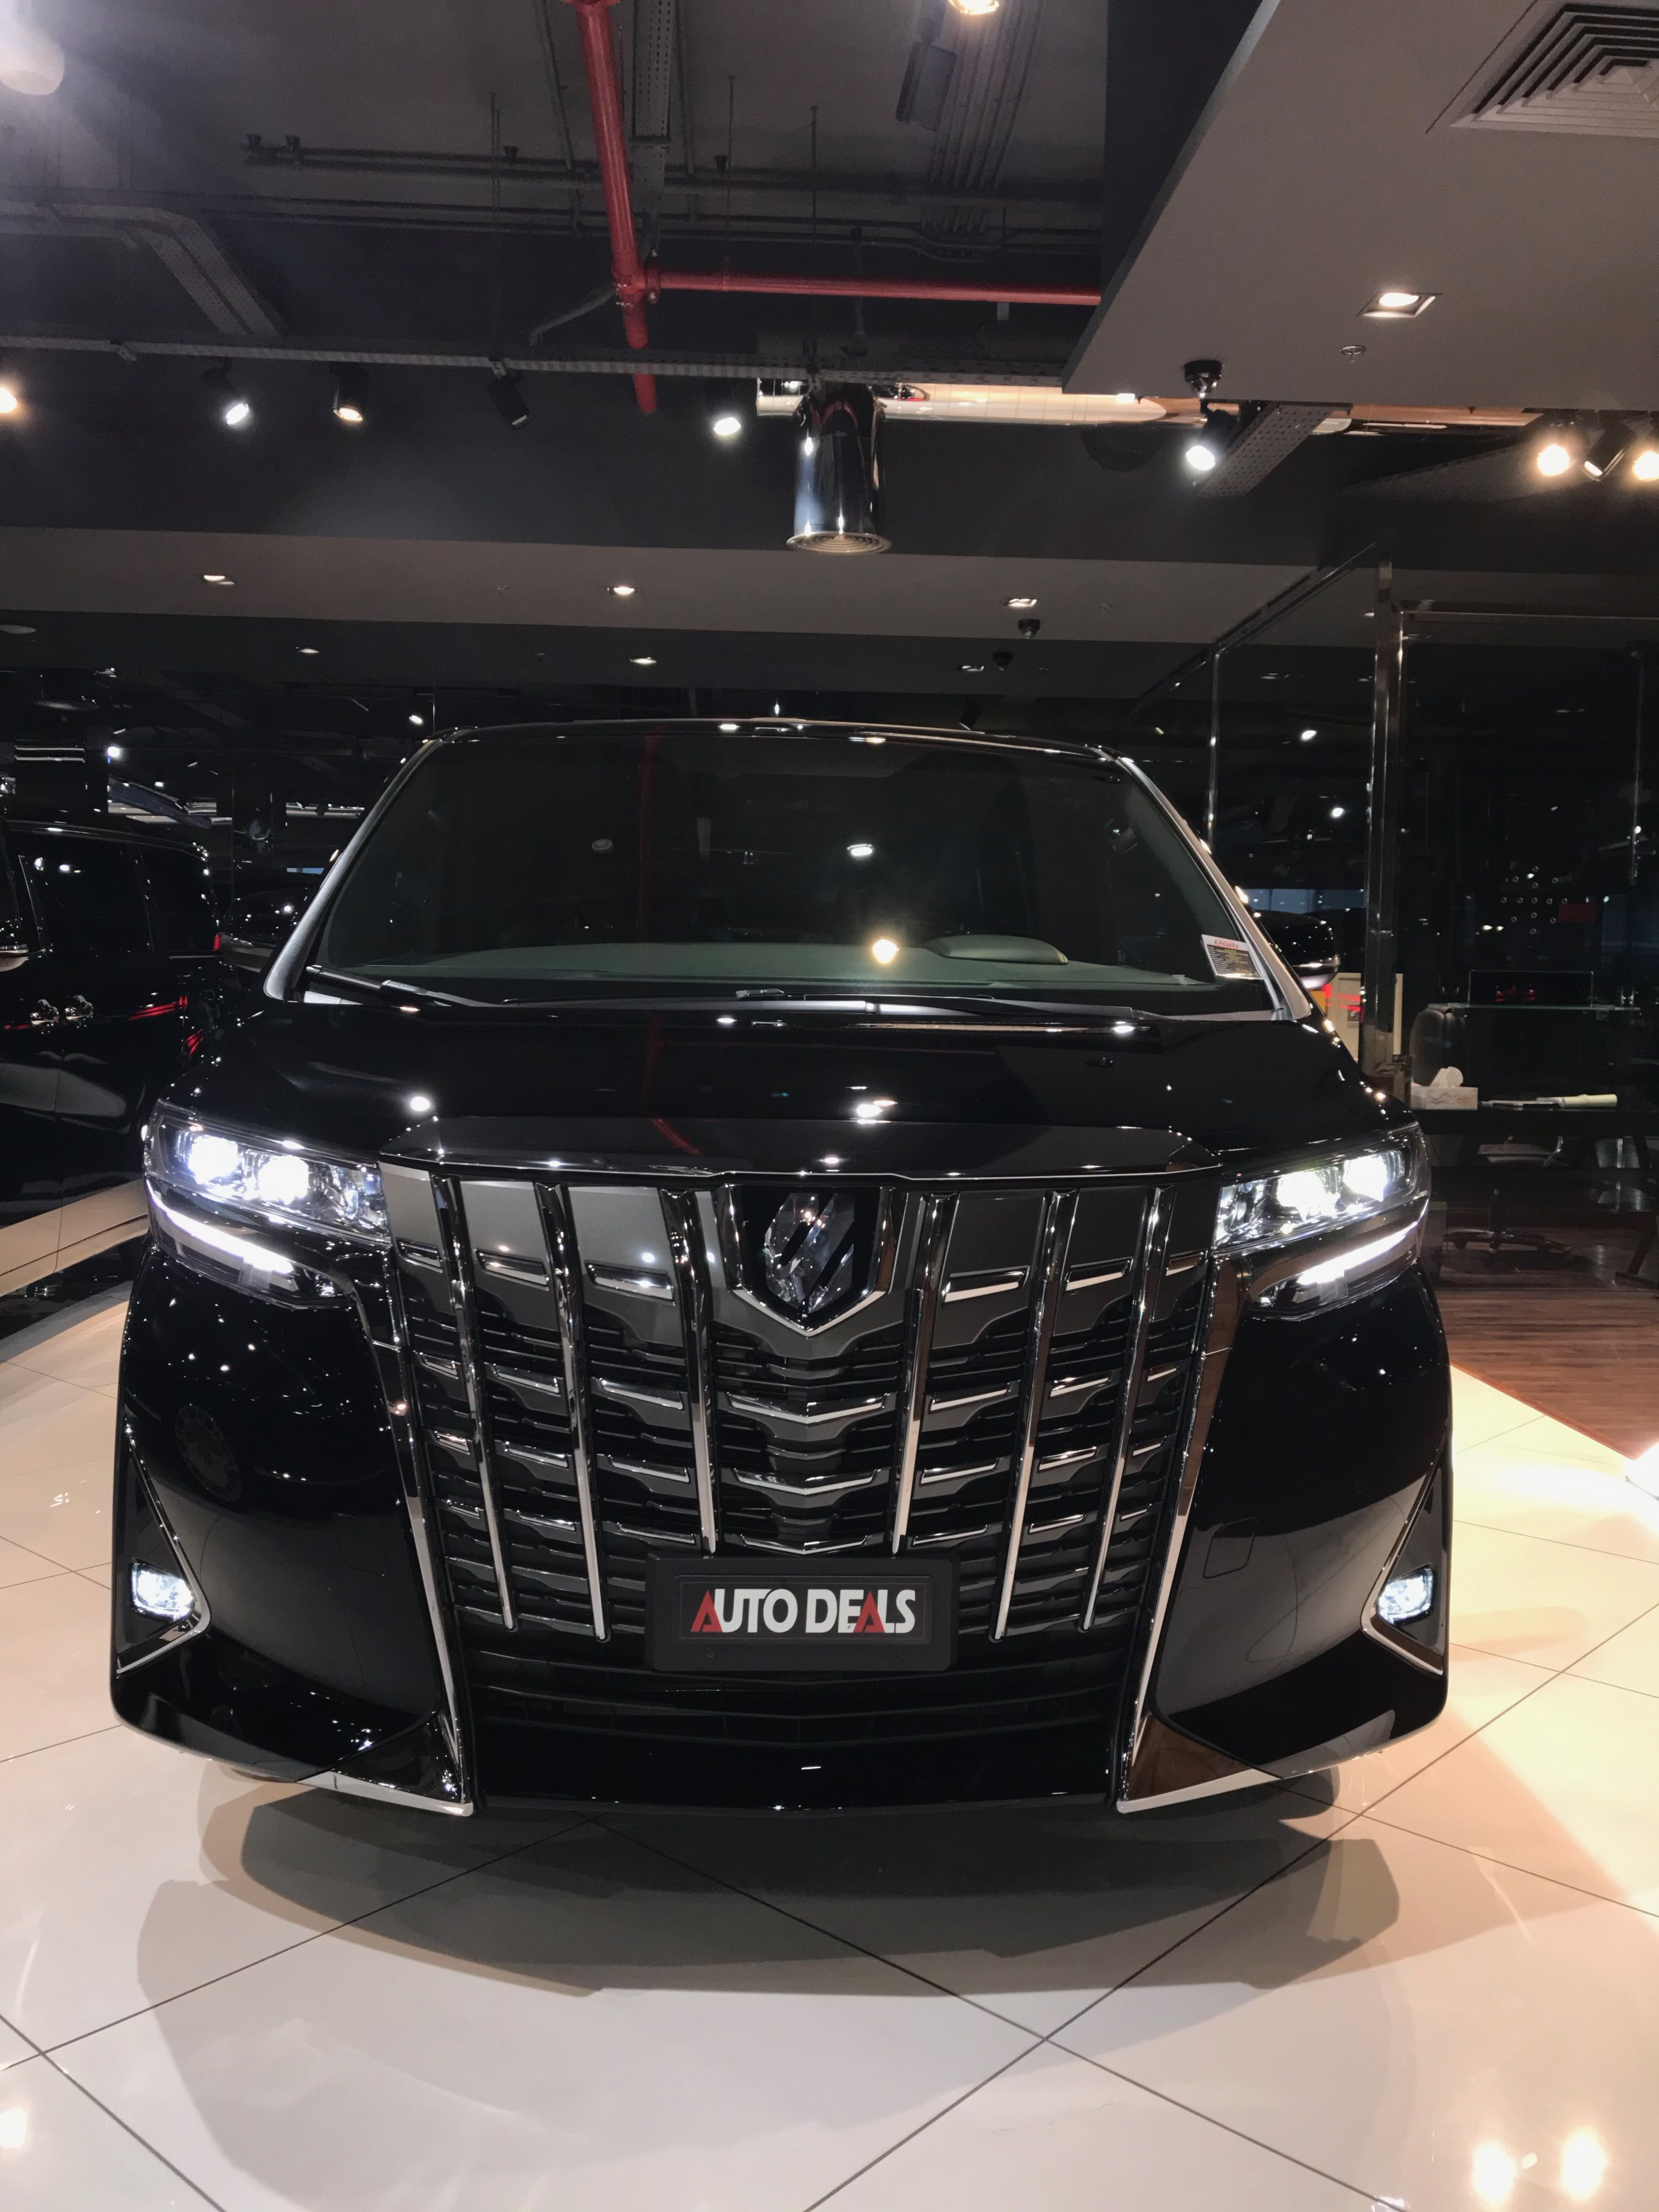 Toyota Alphard Executive Lounge V6 1 23 Crore Real Life Review Mobil Mewah Mobil Mobil Impian